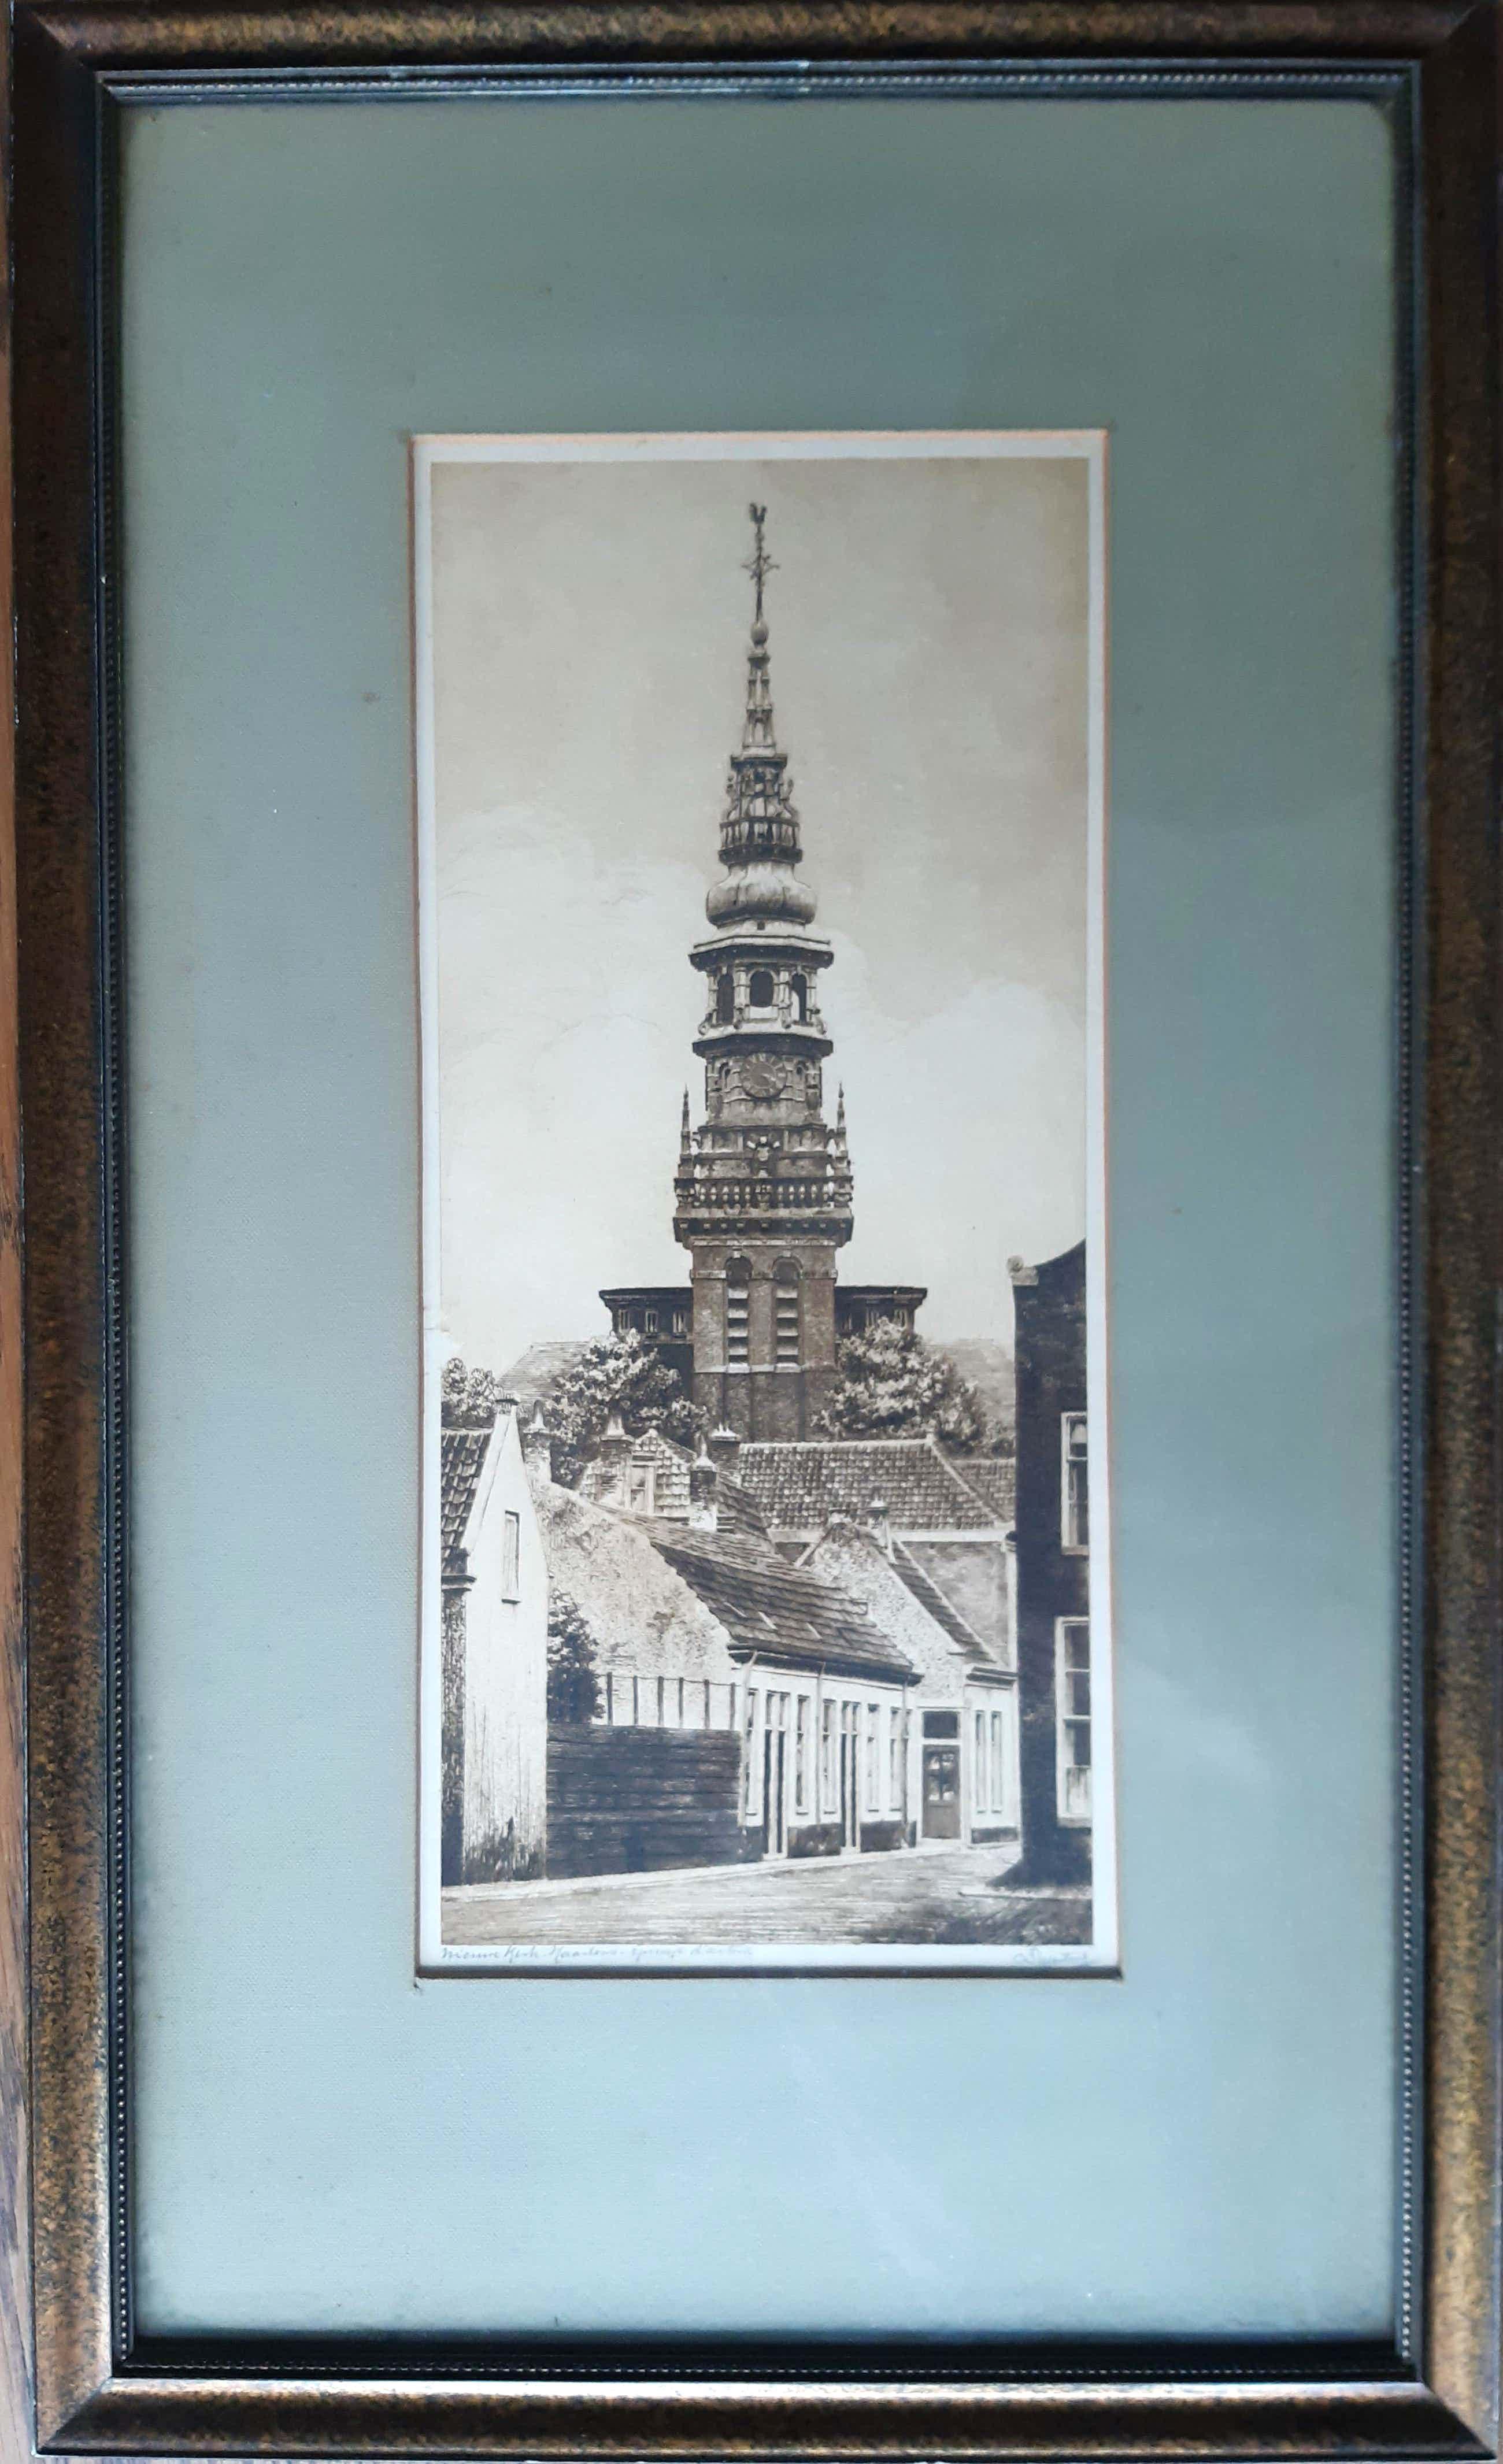 Dirk Harting - Nieuwe Kerk, Haarlem kopen? Bied vanaf 45!